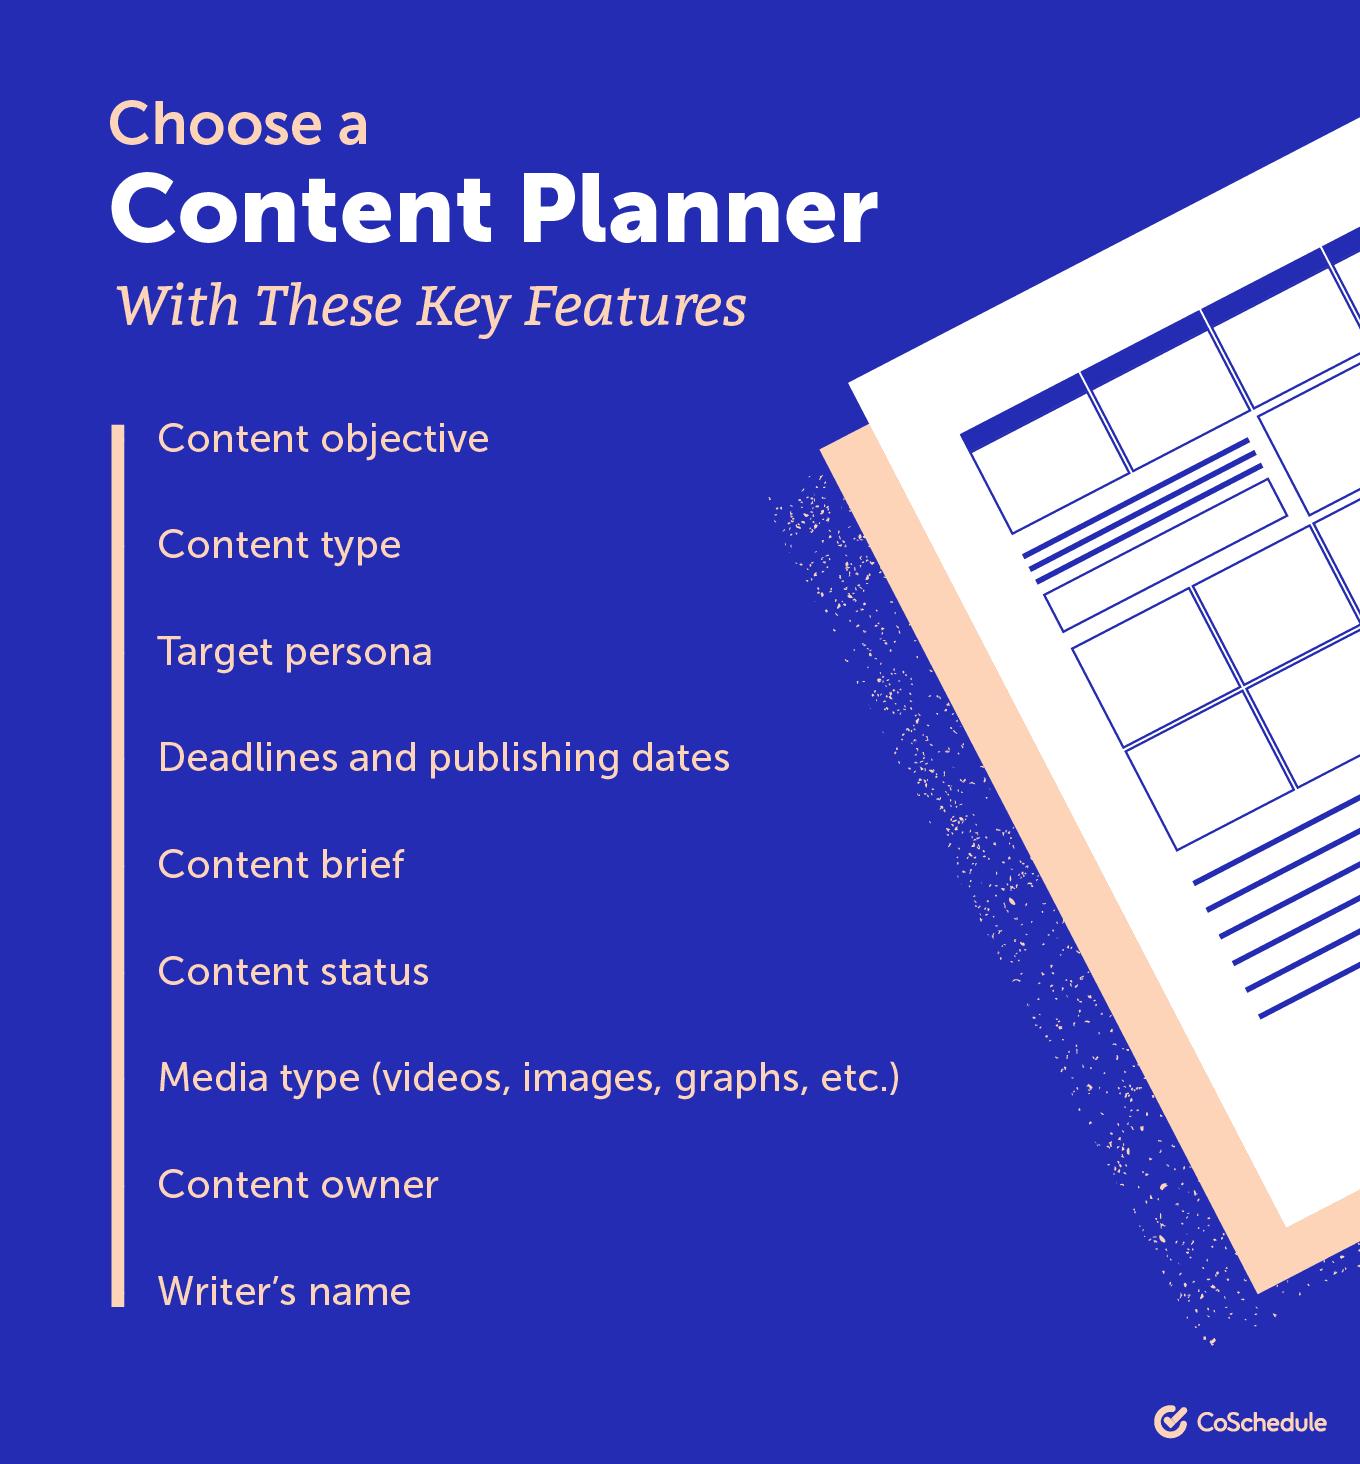 Choosing a content planner